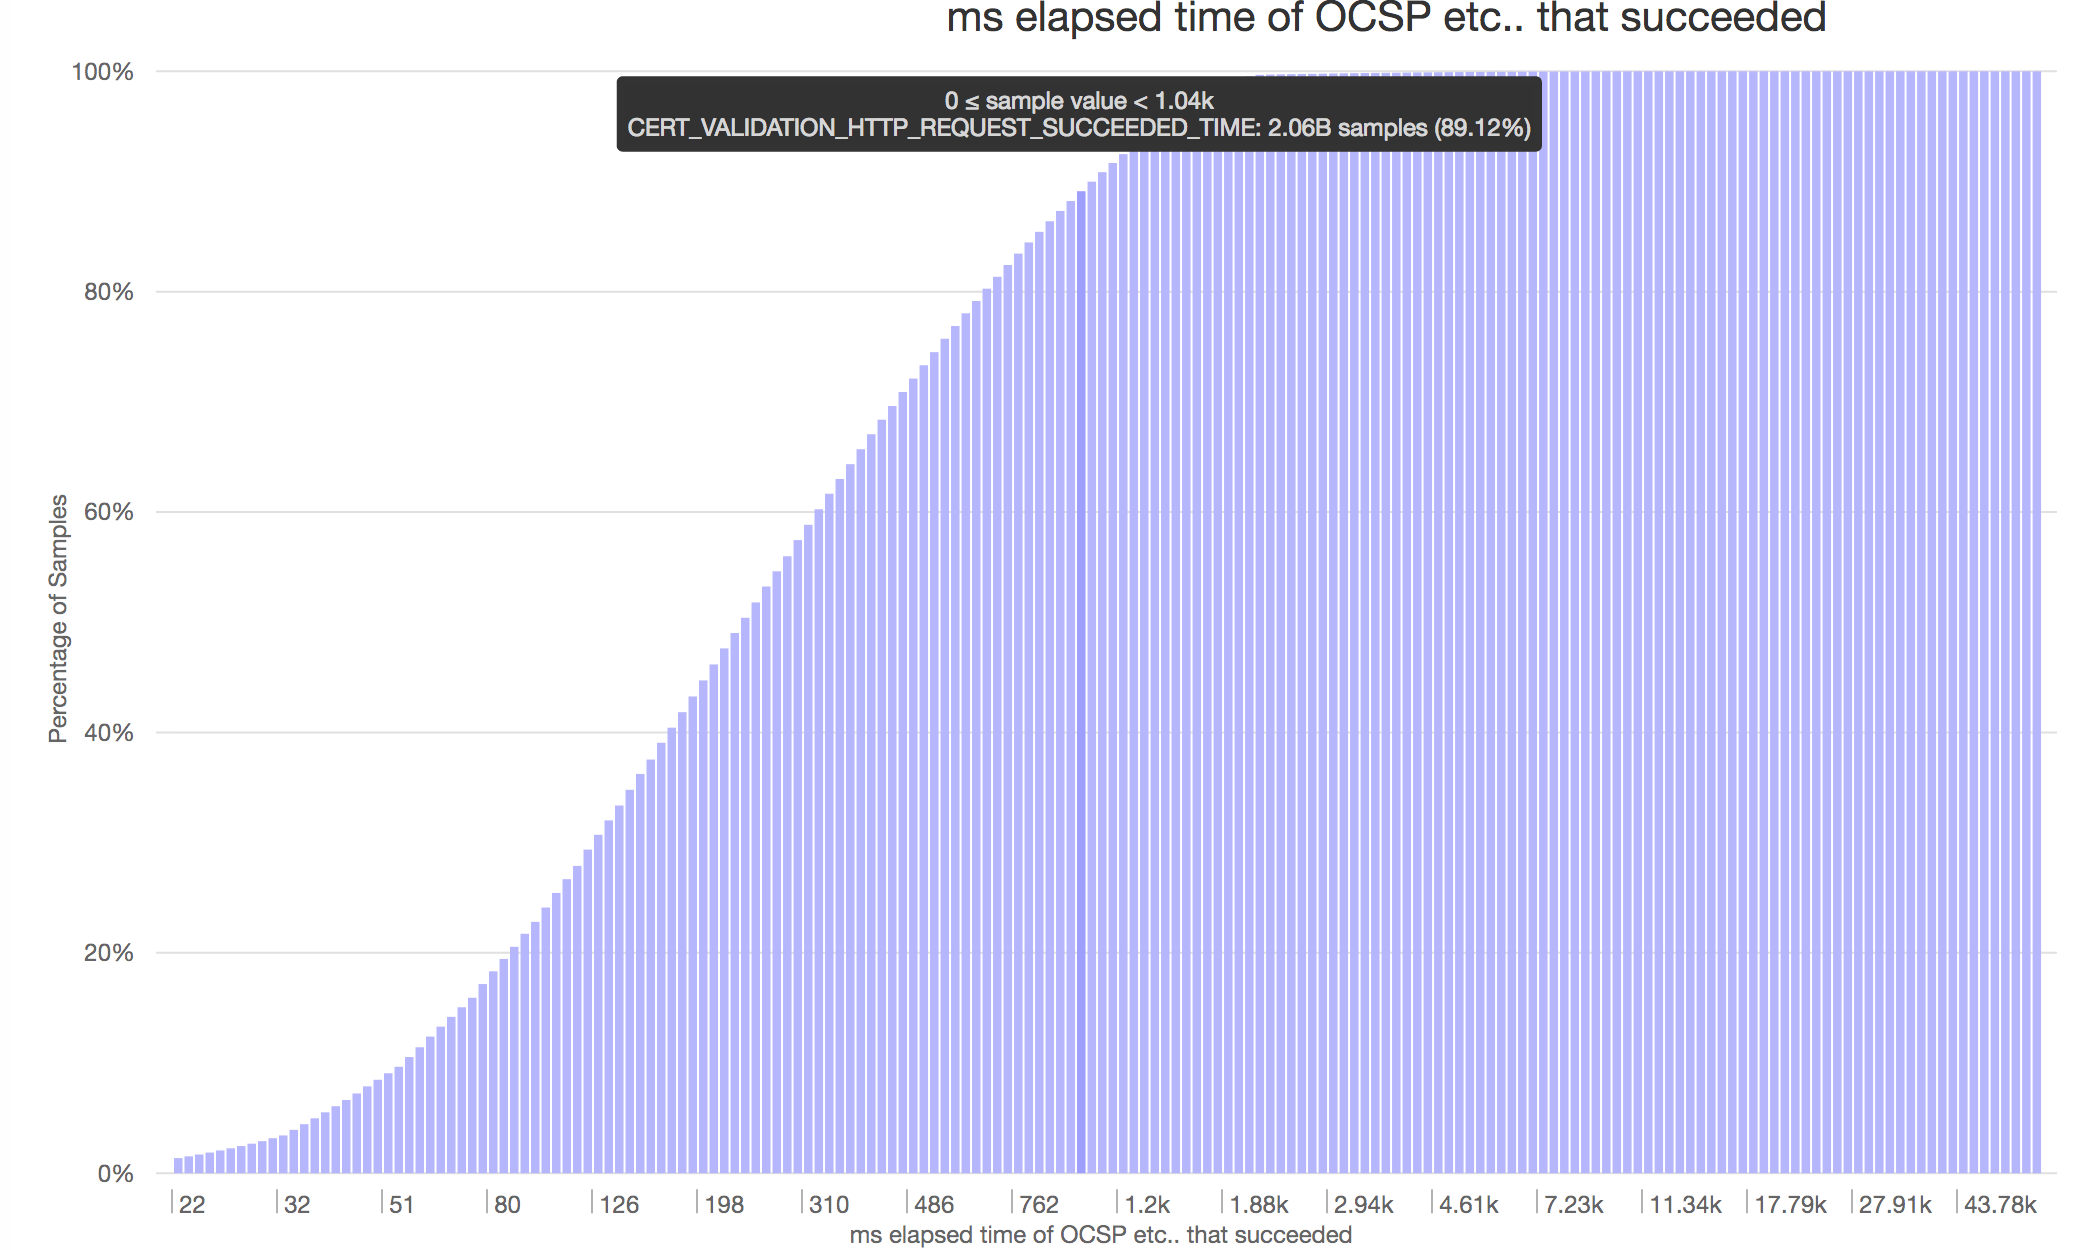 OCSP Success time (ms) CDF